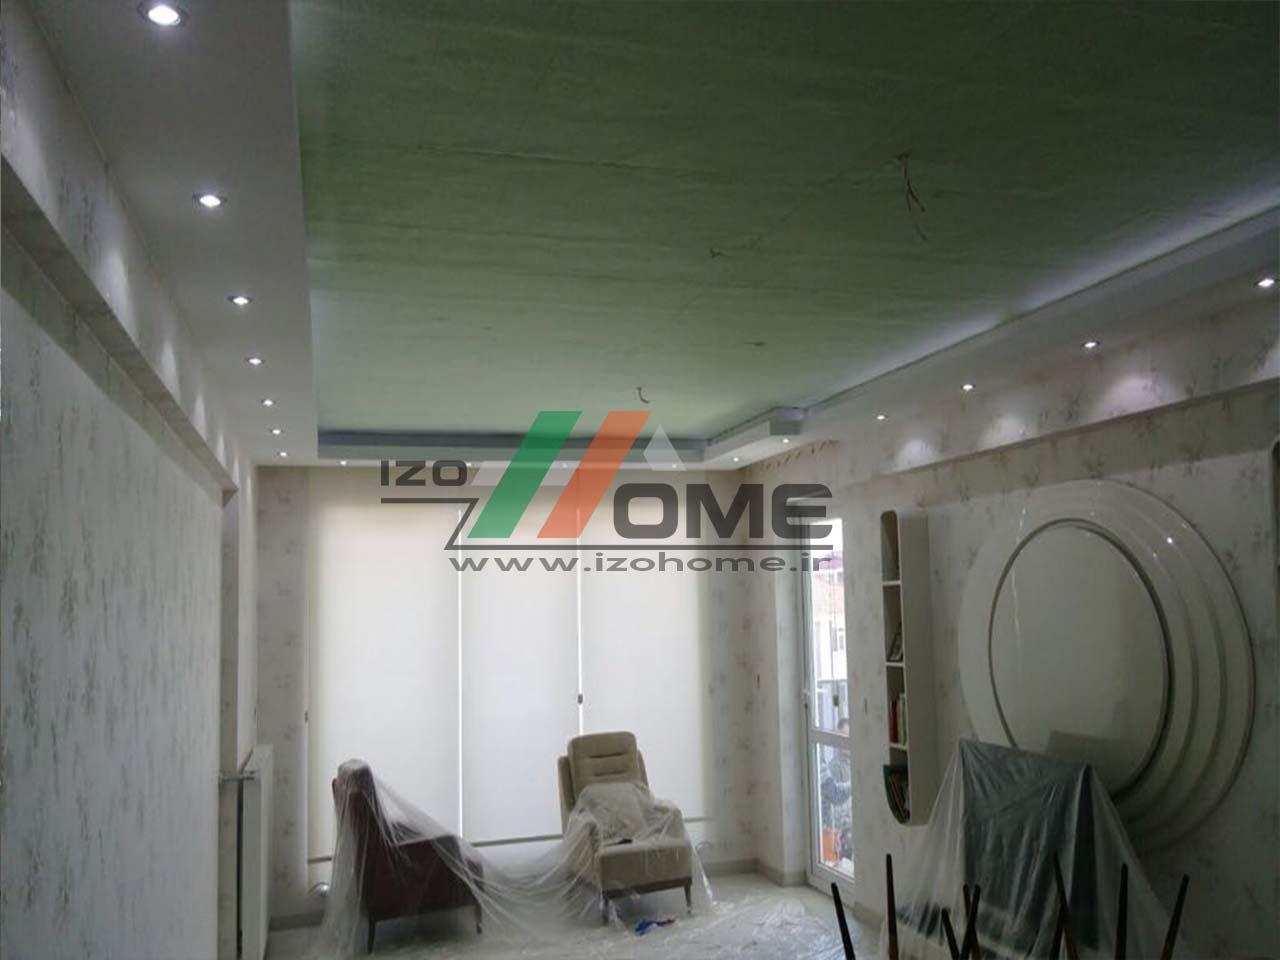 izohome89 - عایق صوتی برای سقف